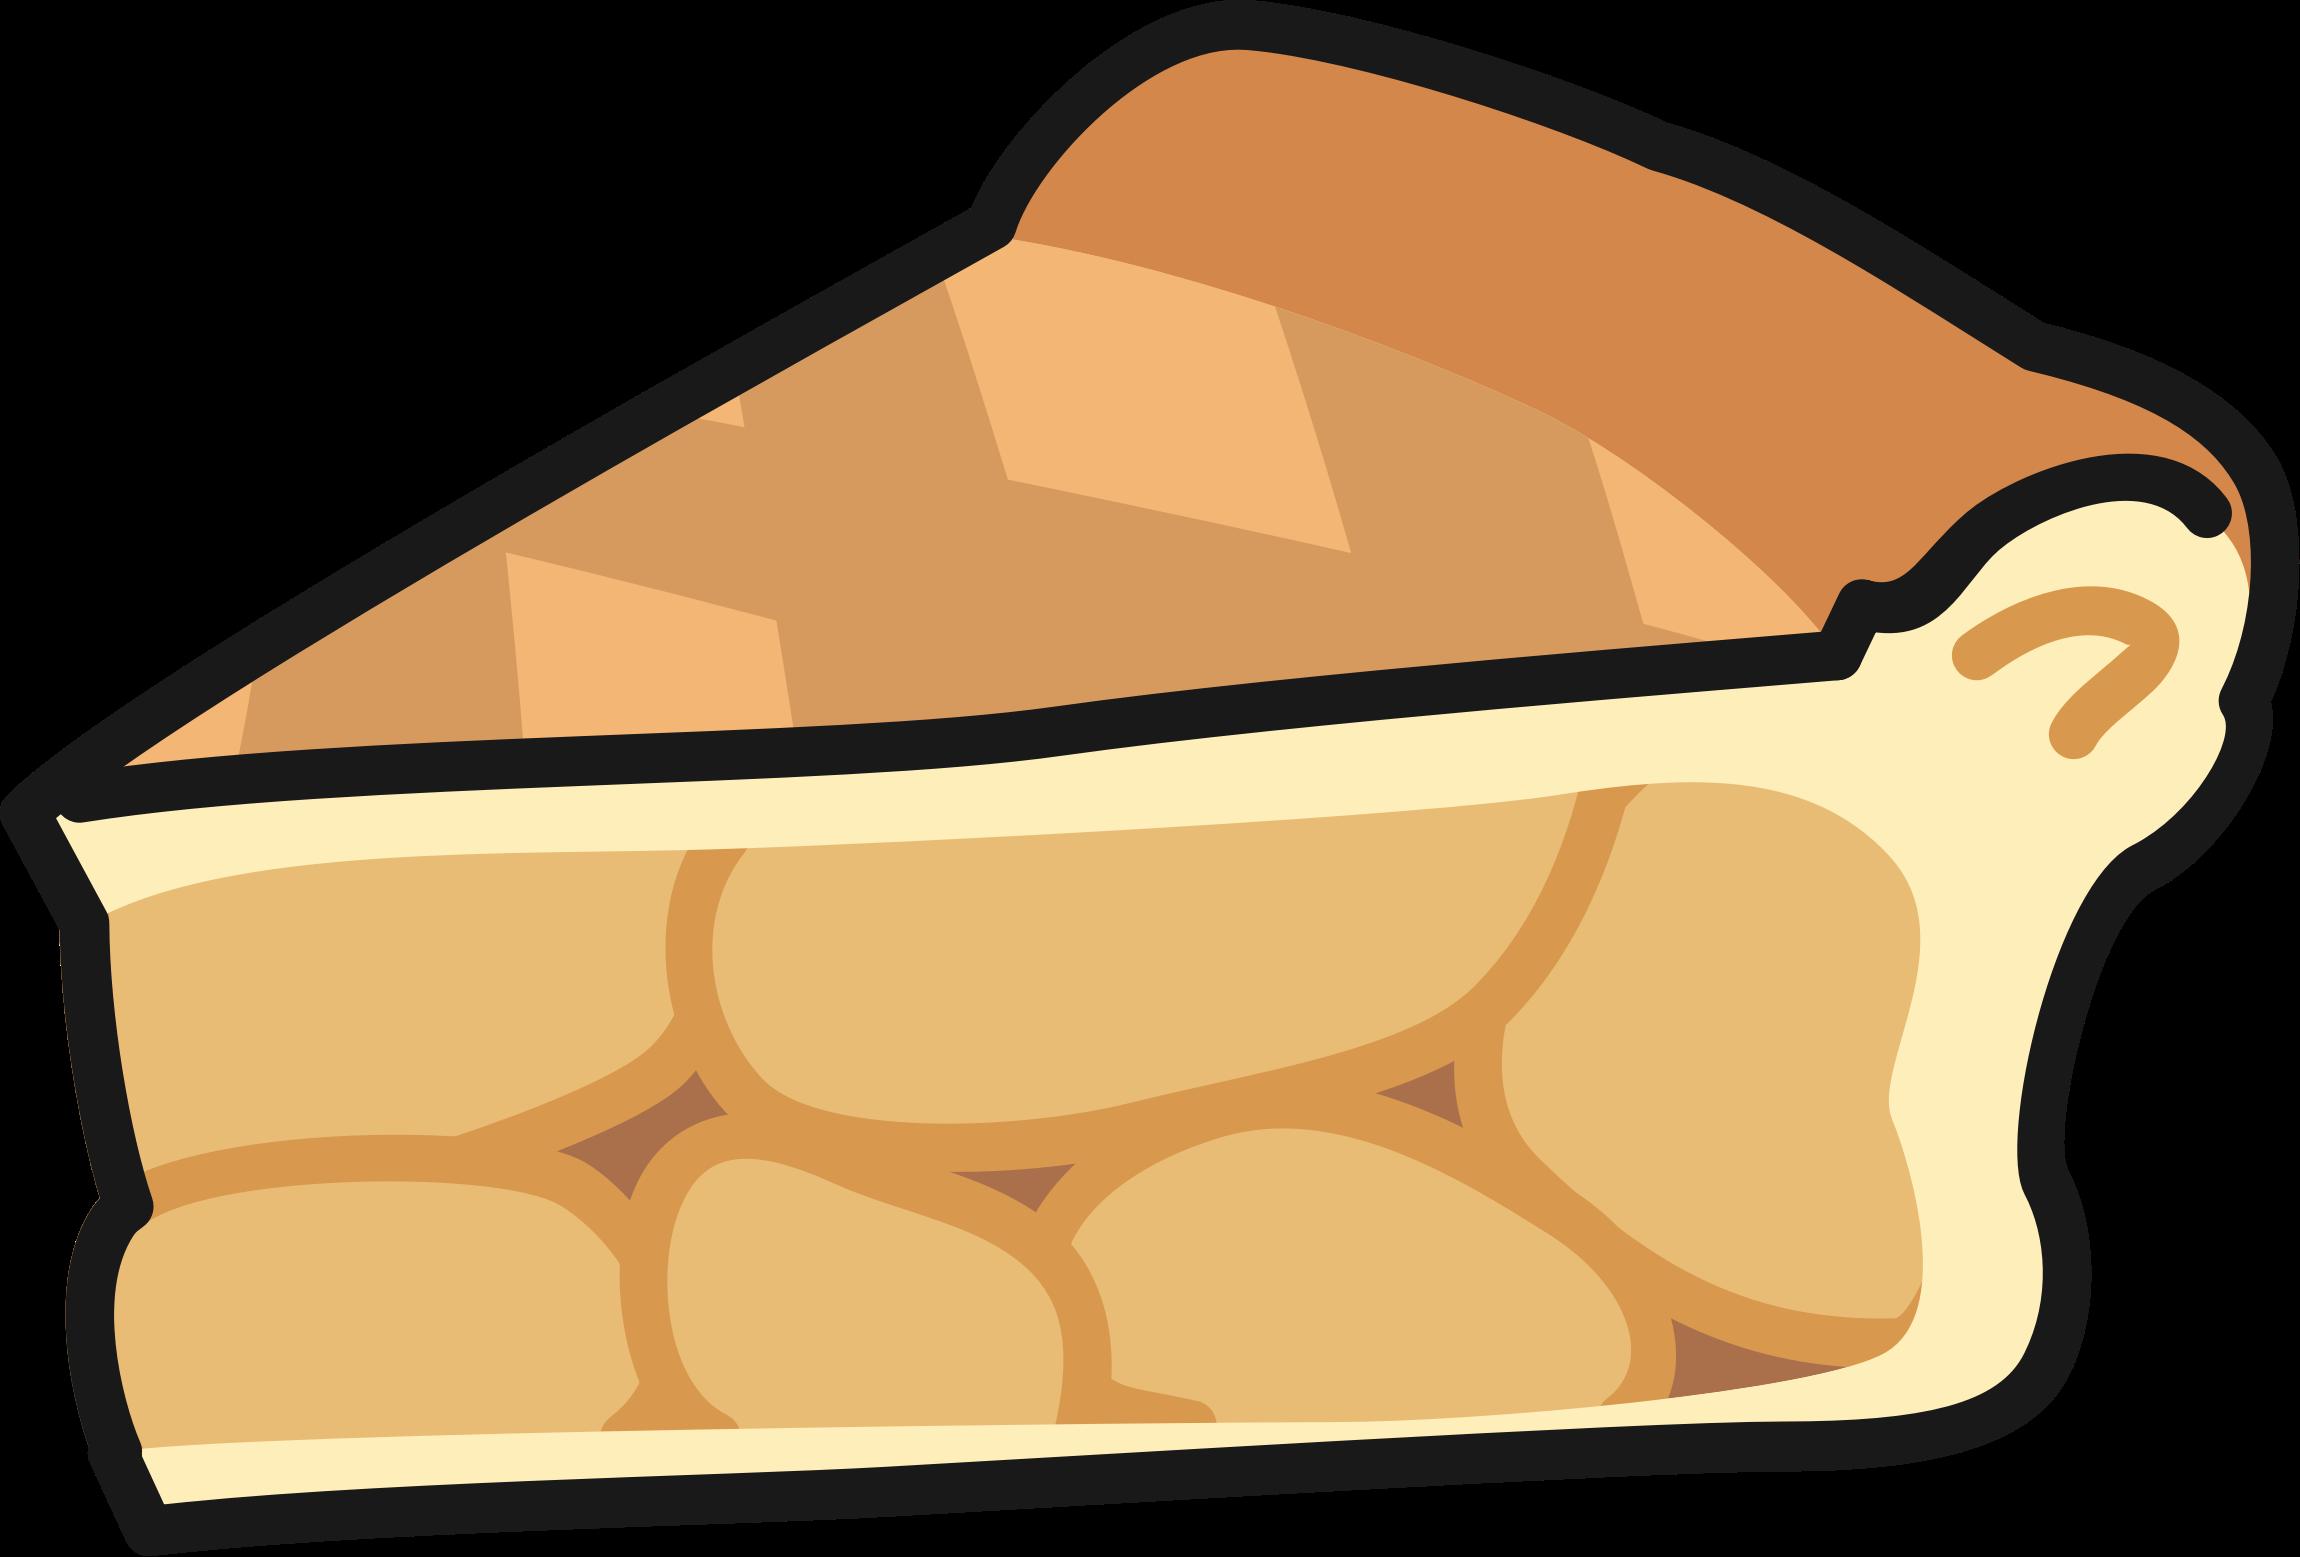 Pie clipart apple pie. Slice of big image